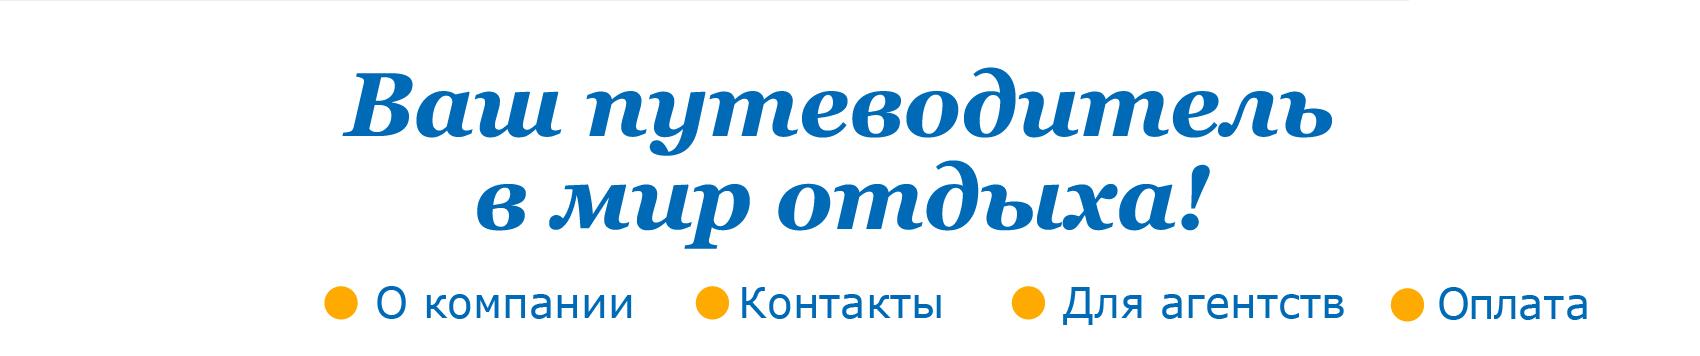 Росинтур слоган